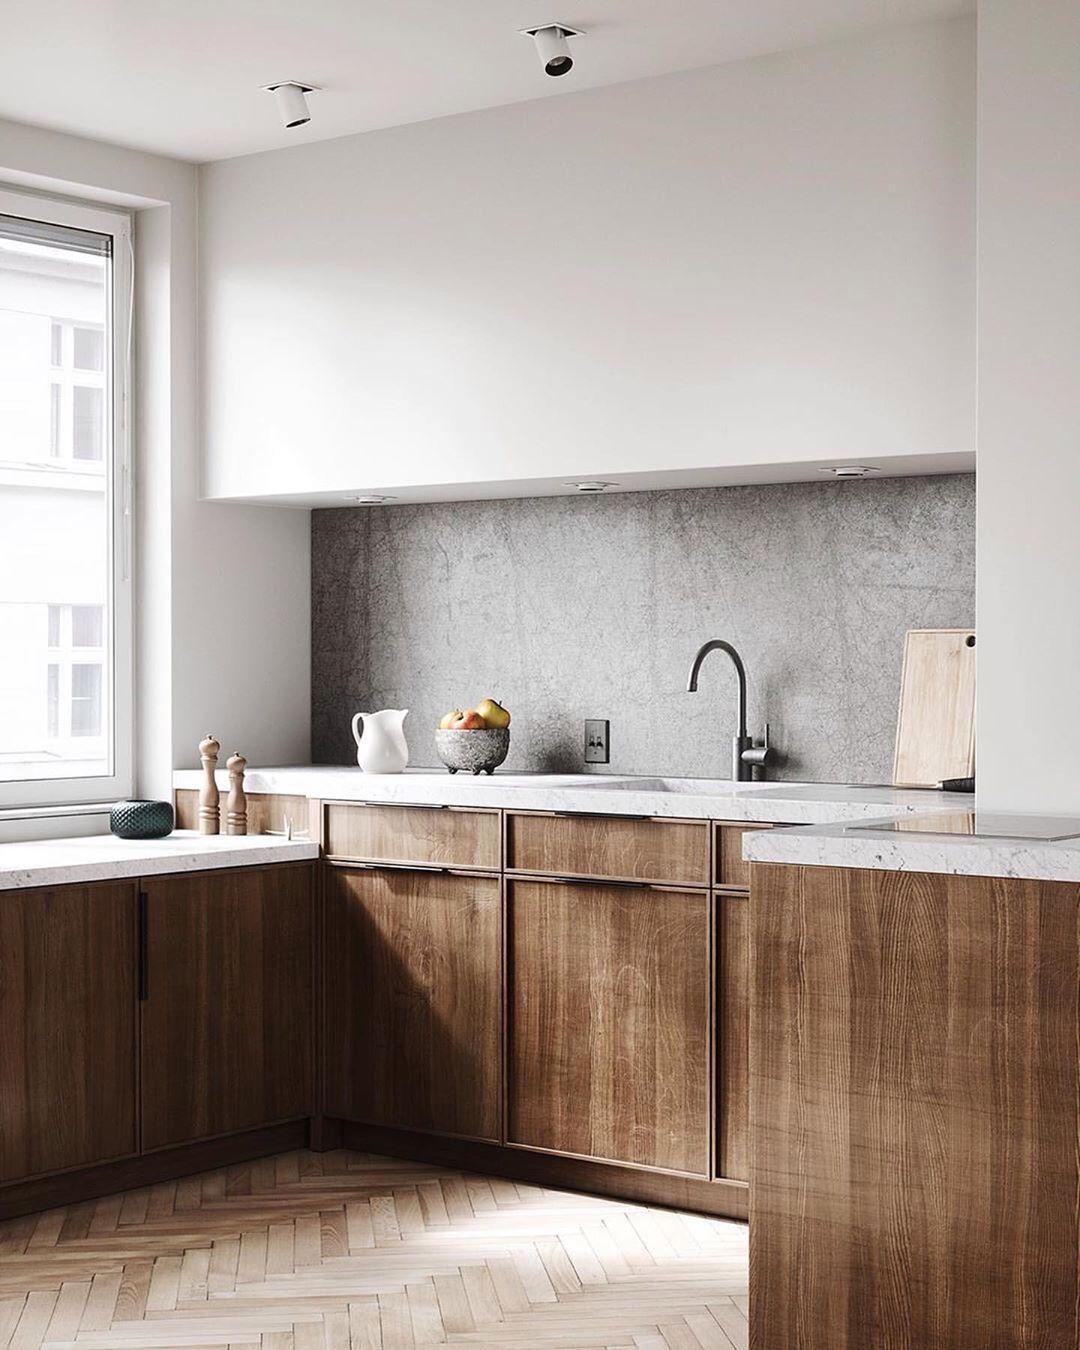 Idealna Kuchnia On Instagram Piekna Prosta Kuchnia Tez Sie Wam Podoba Czy Wieje Nuda Obse Kitchen Design House Interior Home Interior Design